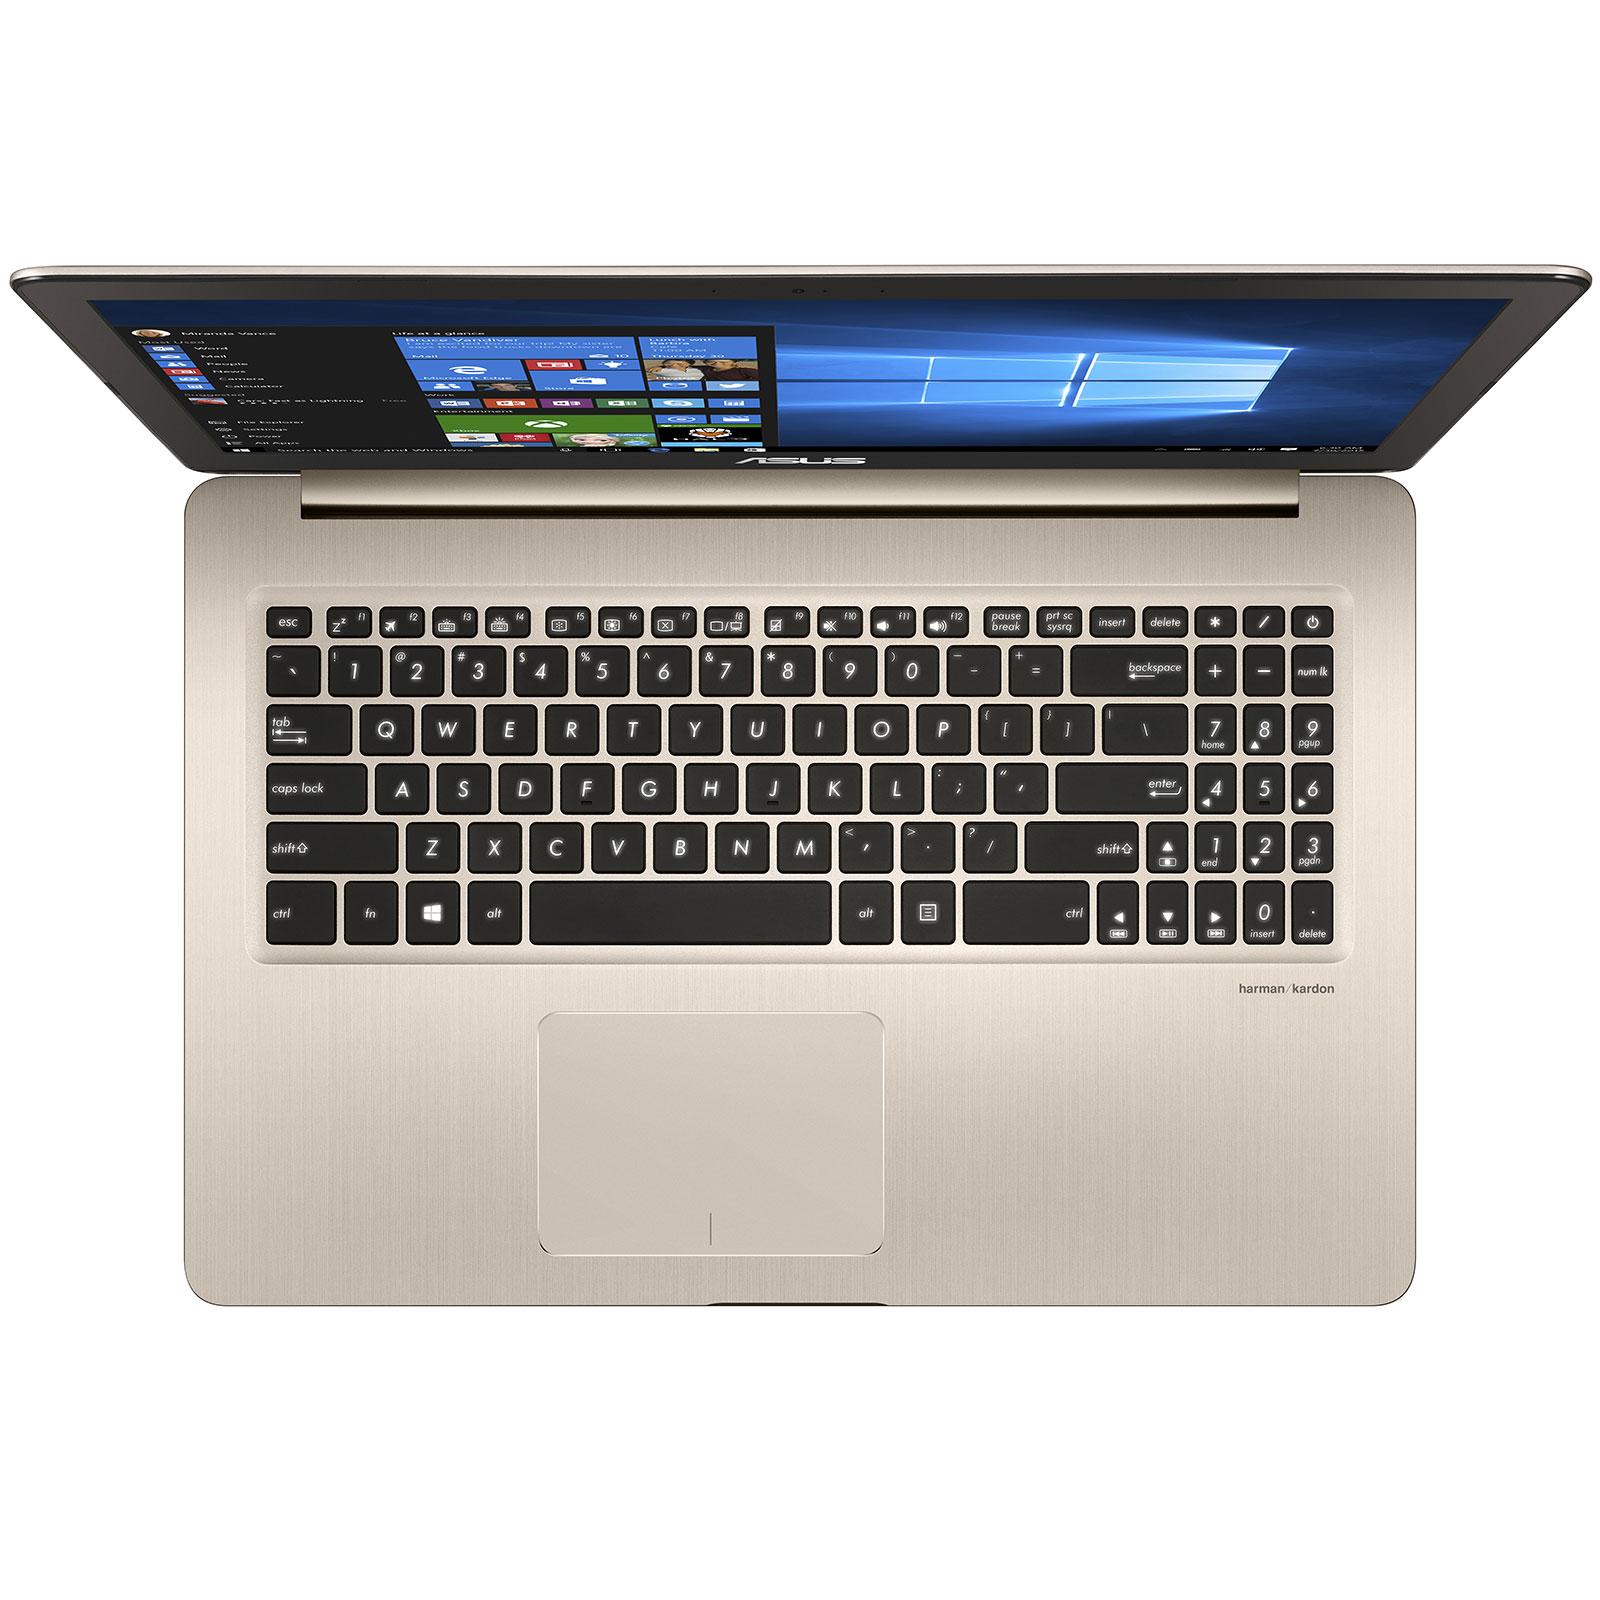 Asus NX580VD-FI523R - PC portable Asus - Cybertek.fr - 2